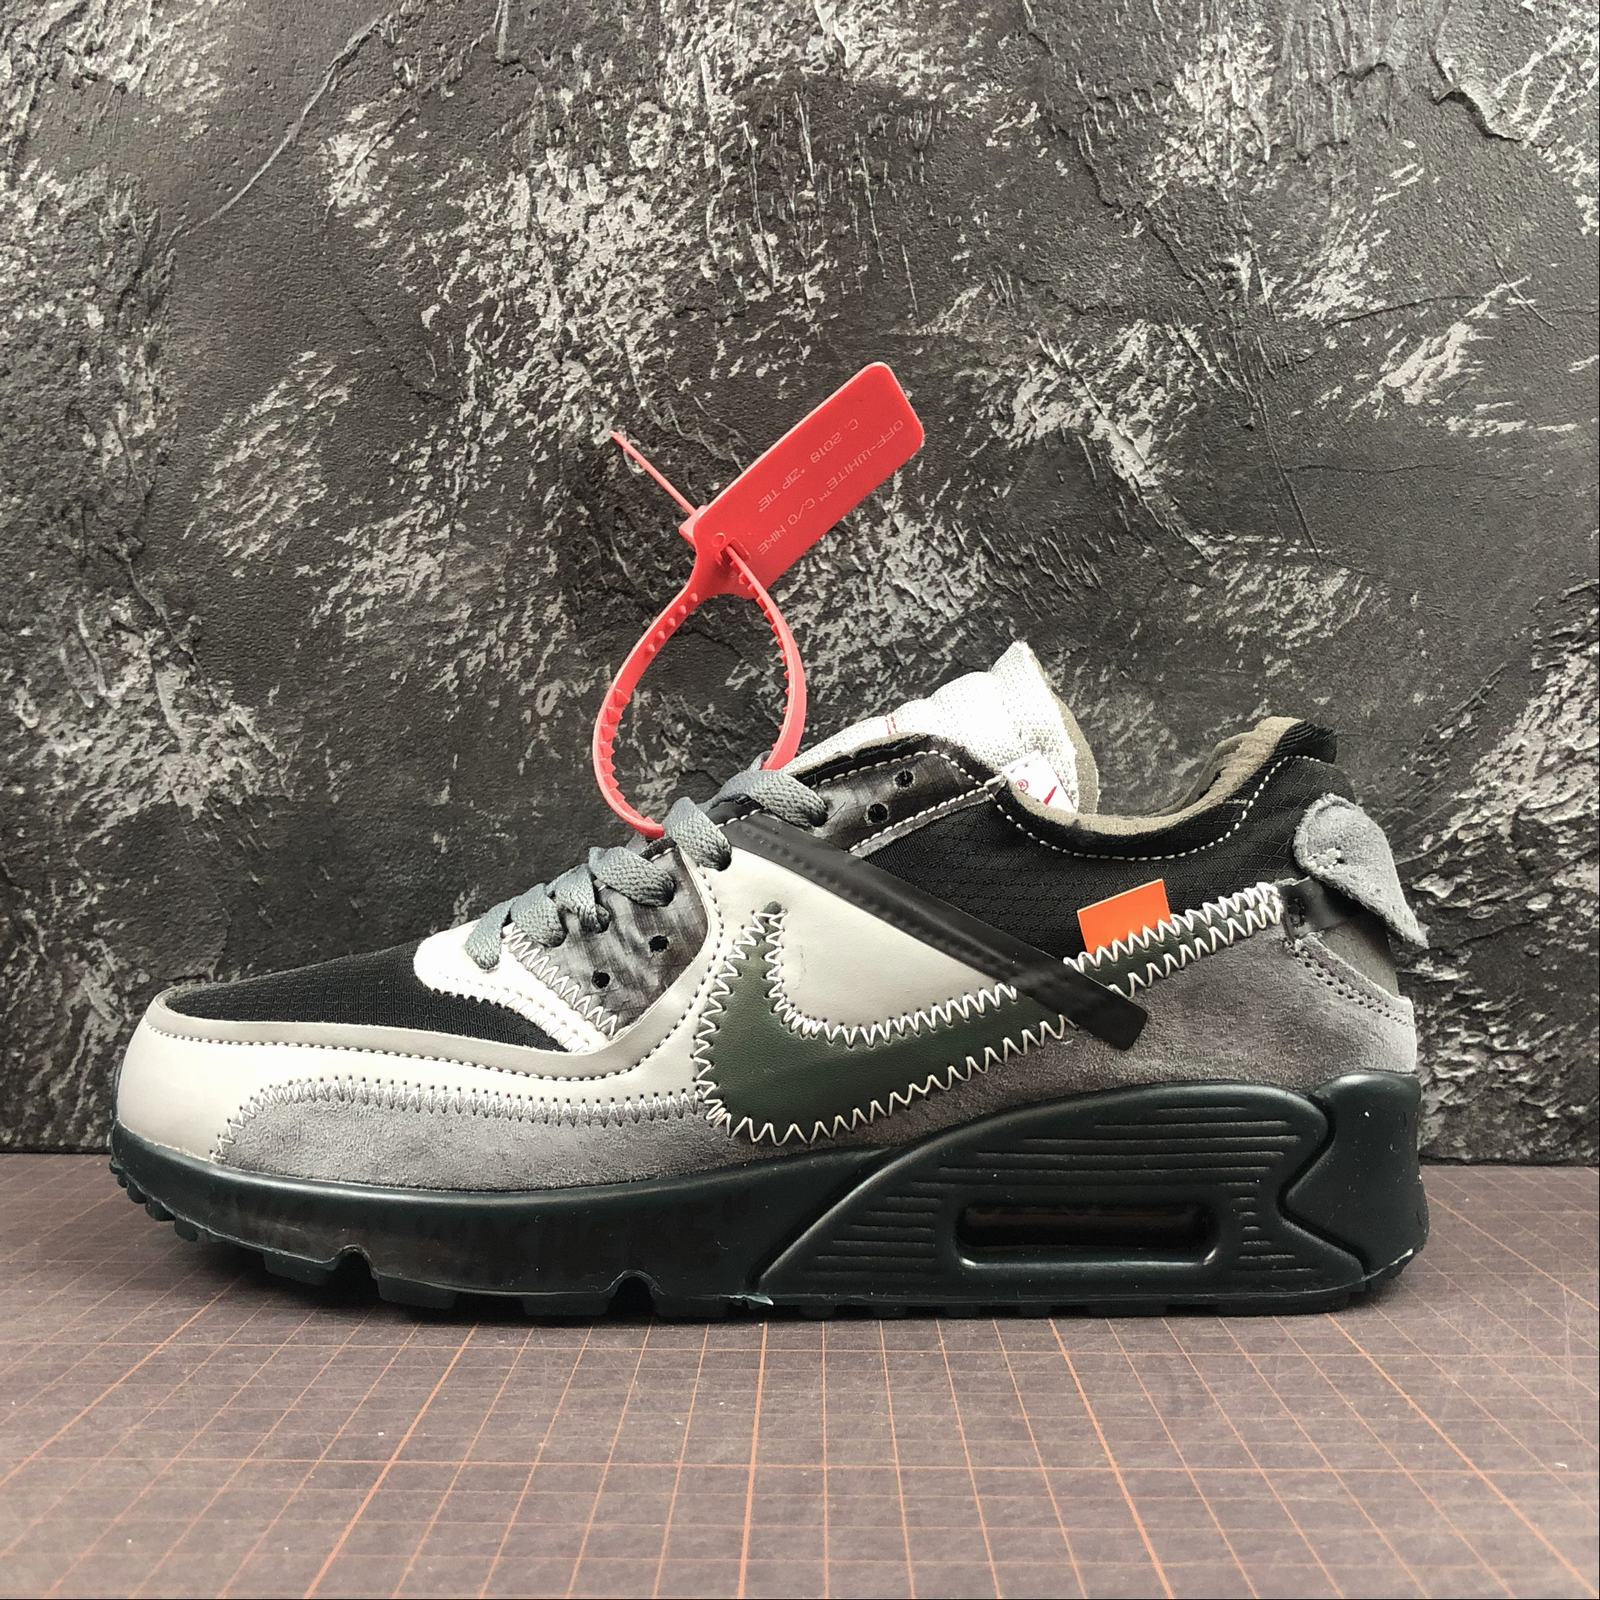 c1ab21b8 Мужские кроссовки Nike Air Max 90 x Off-White Men